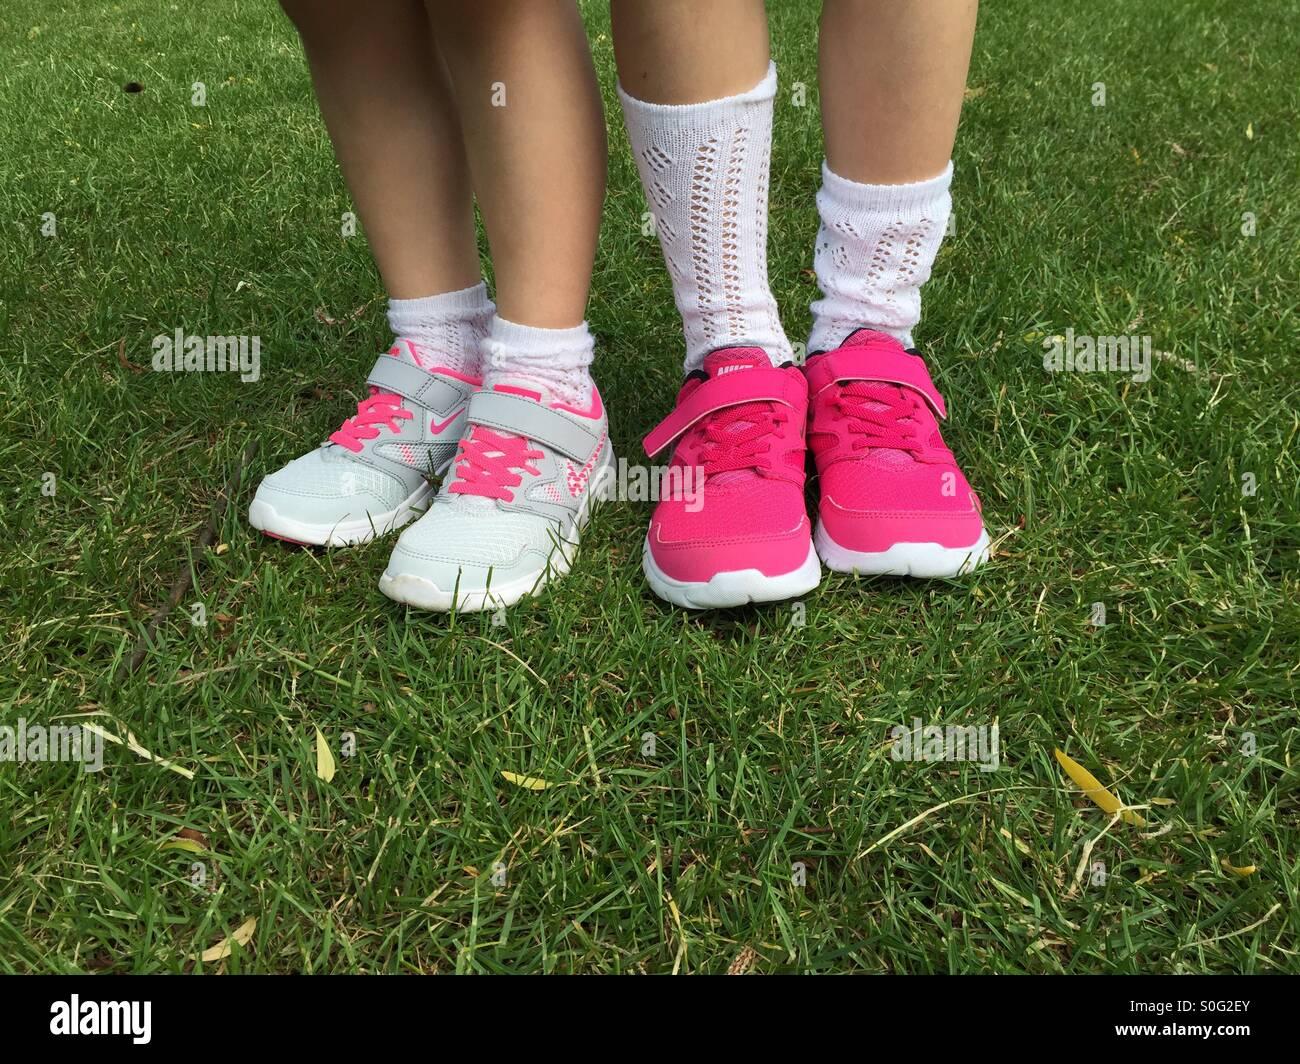 RagazzepiediIndossando Nuovi Nike Foto FormatoriScarpe Bambini bYf6gy7v